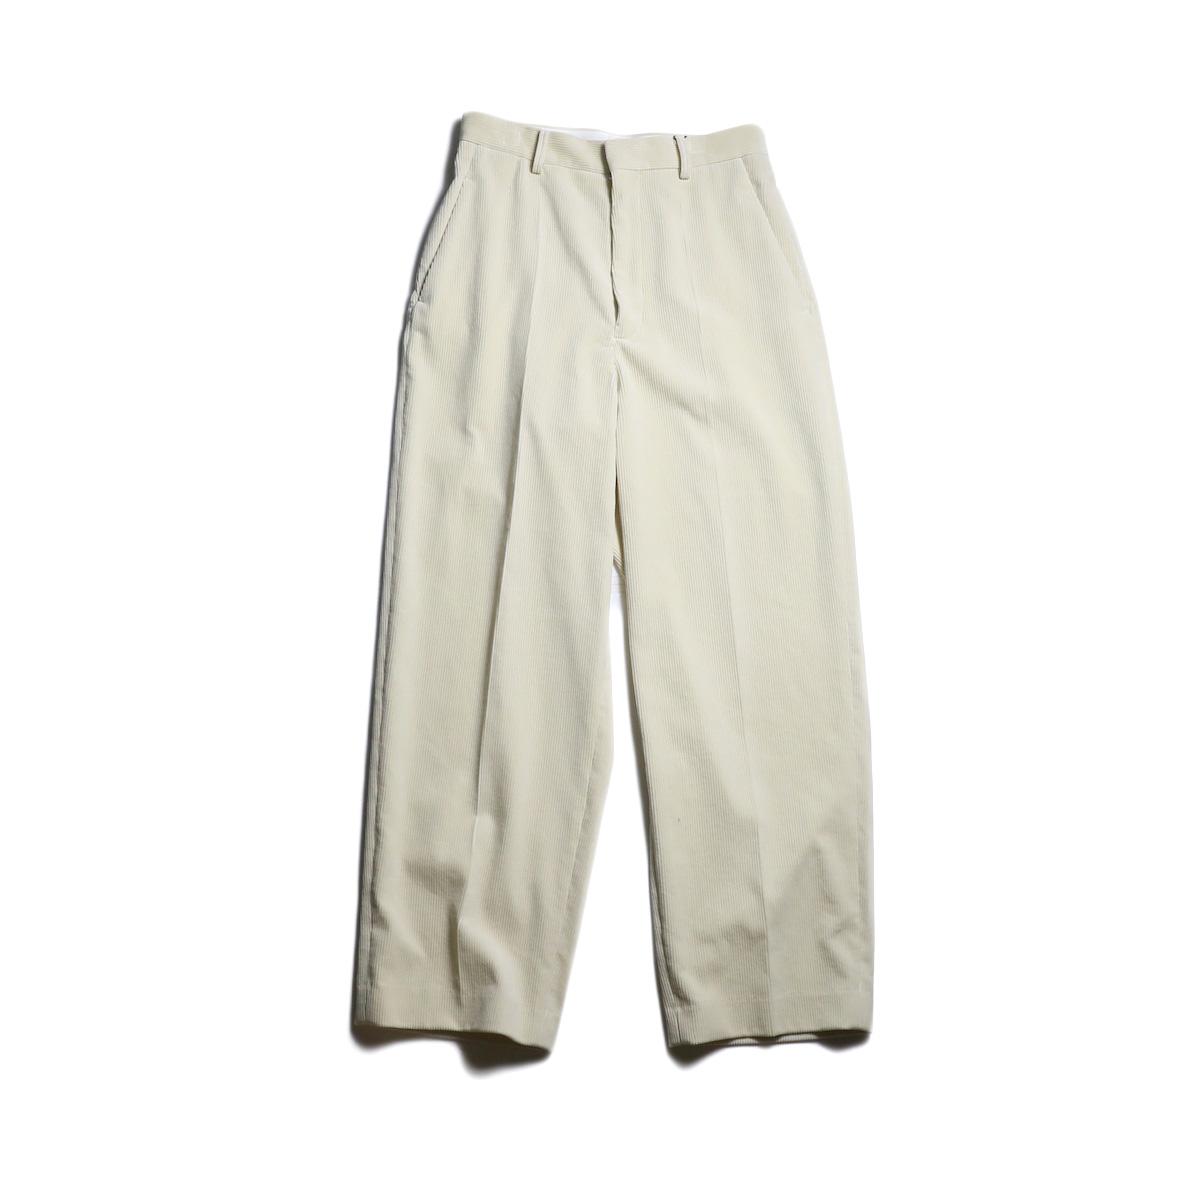 YLEVE / XLS Cotton Corduroy TR (Off)